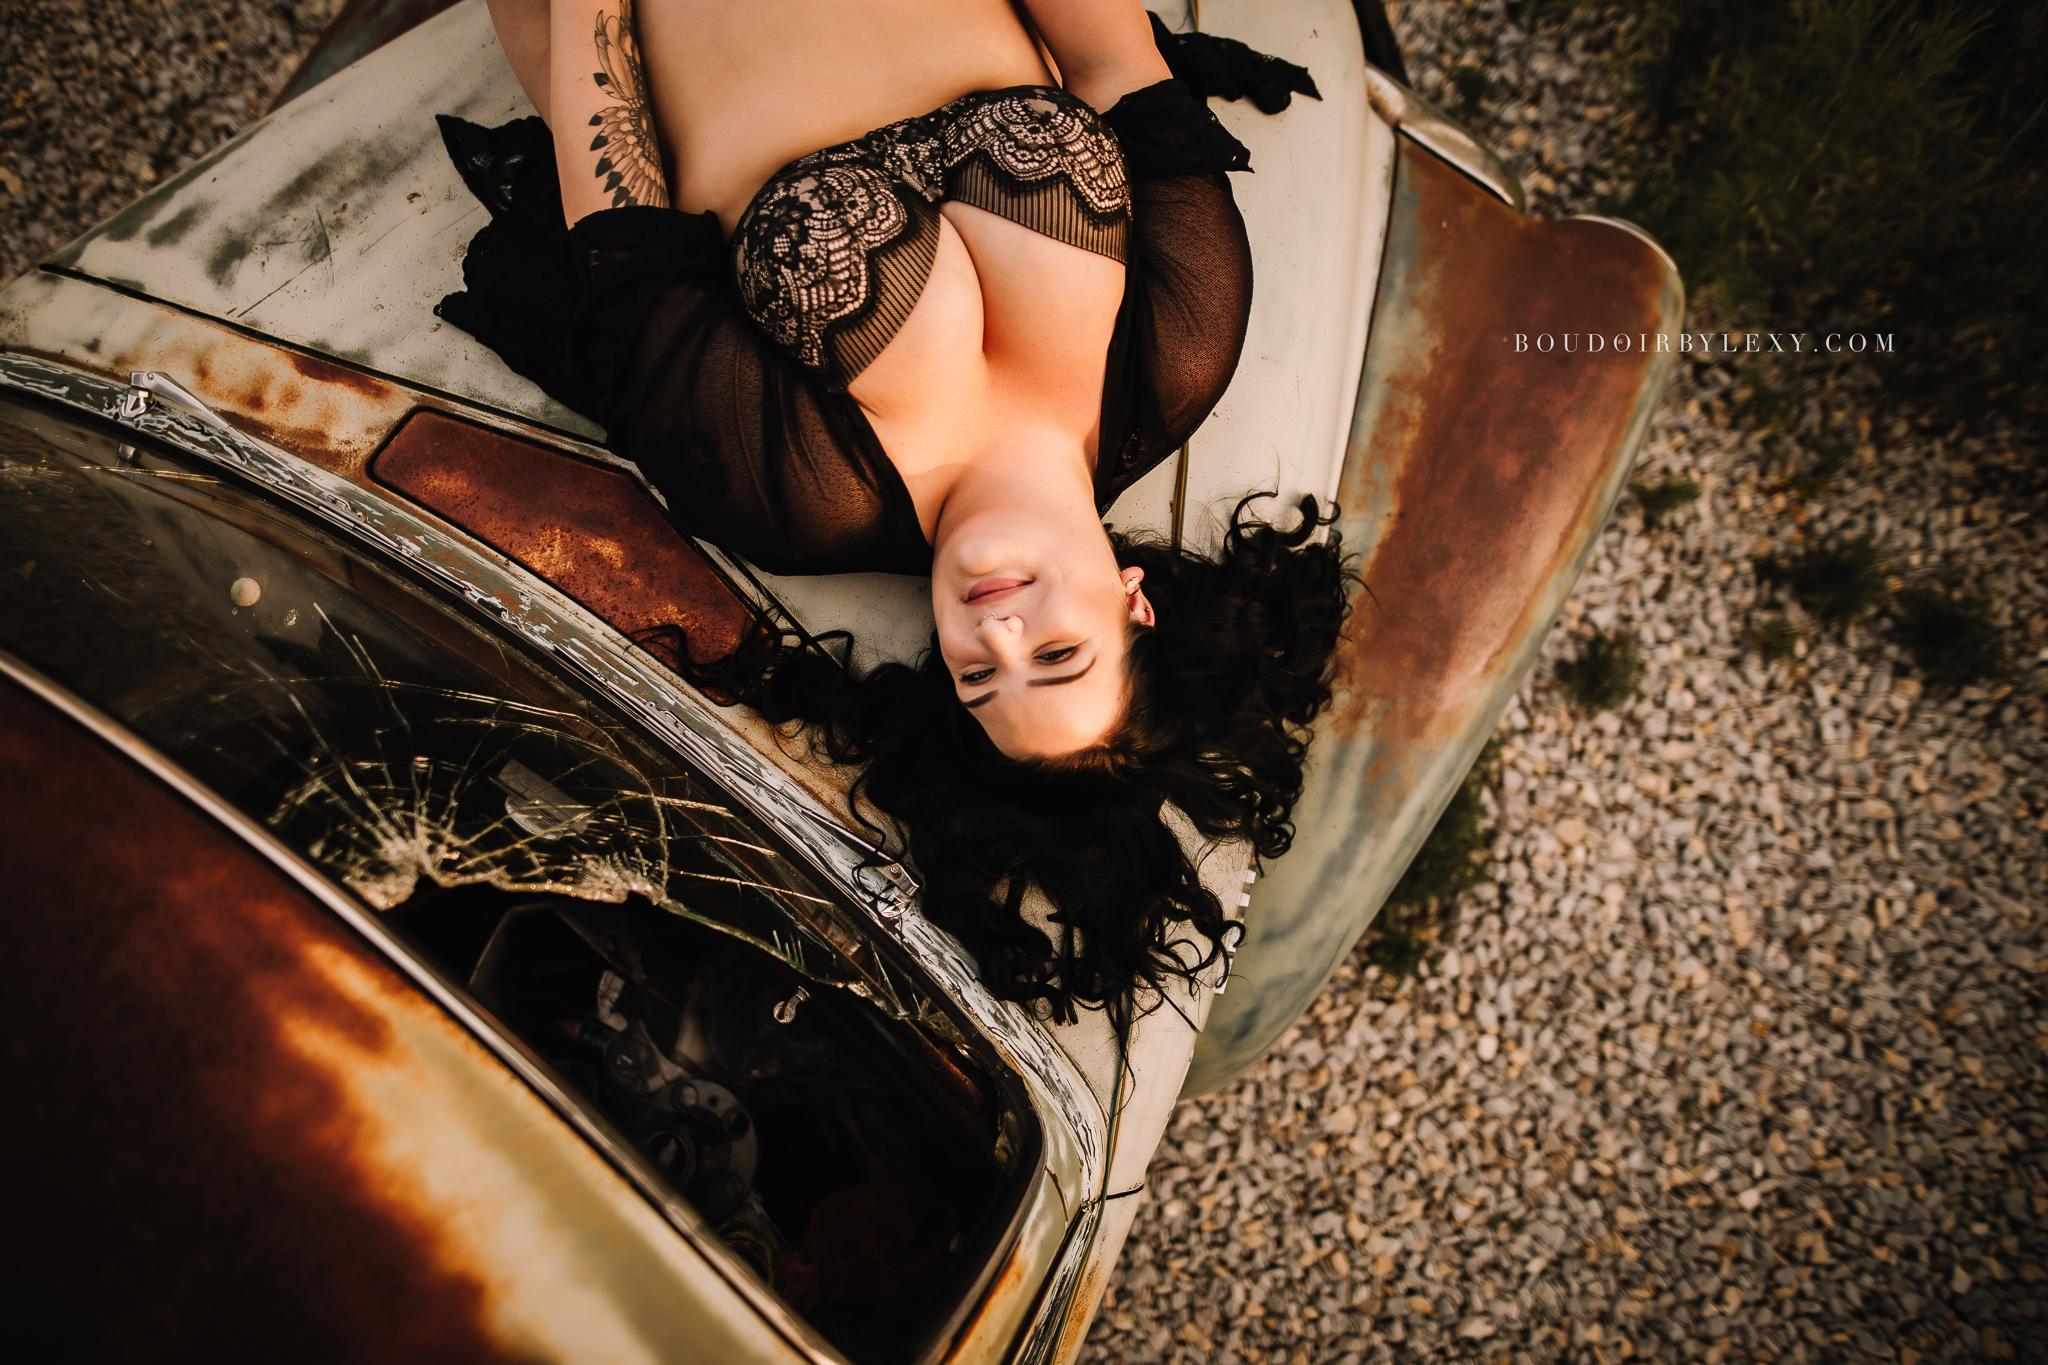 MISS R BOUDOIR BY LEXY CEDAR FALLS IOWA-4.jpg